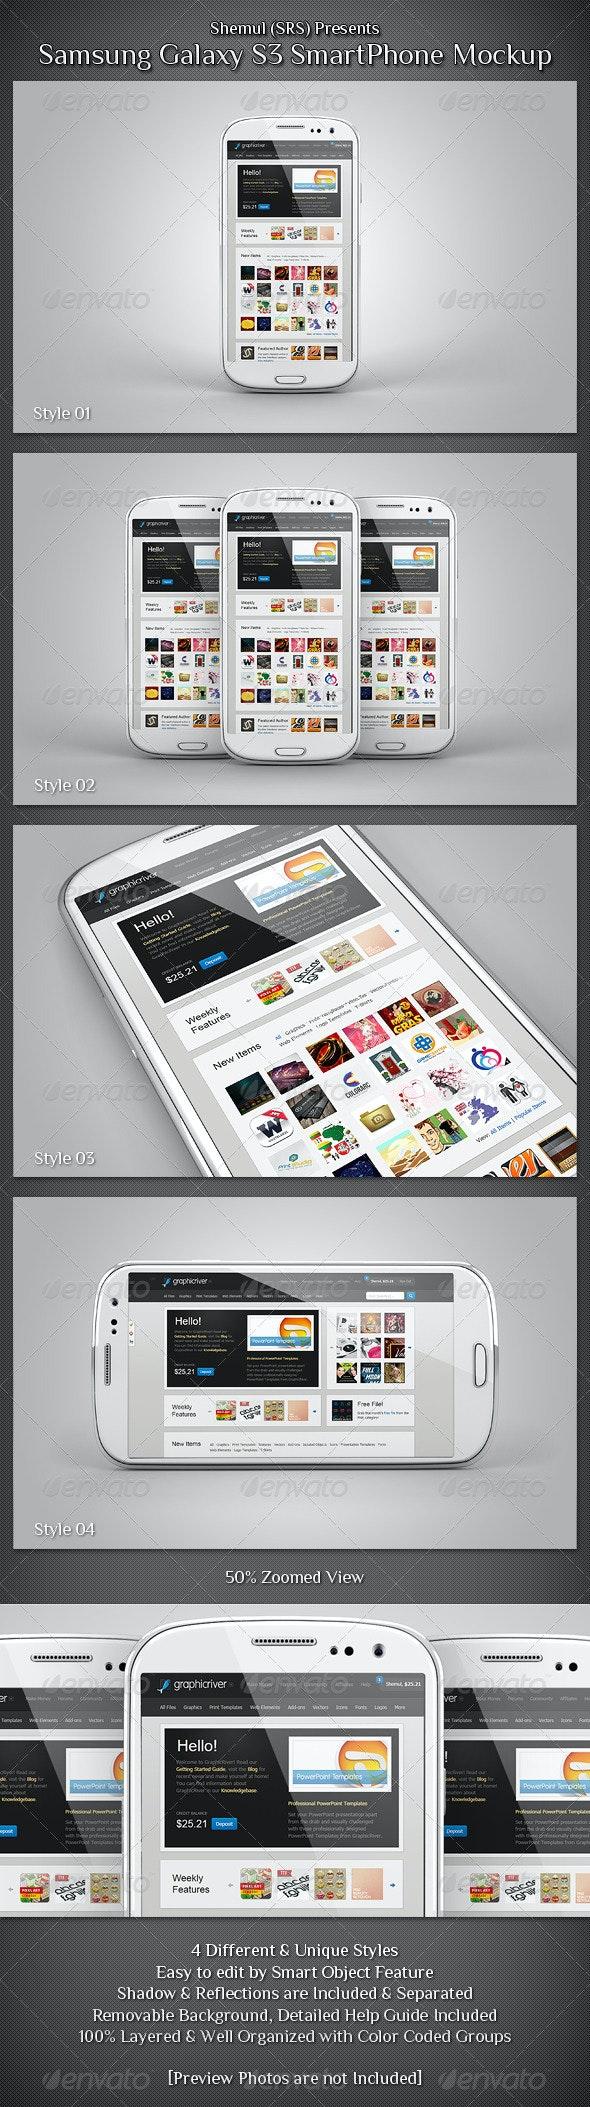 Galaxy S3 Smartphone Mockup - Mobile Displays